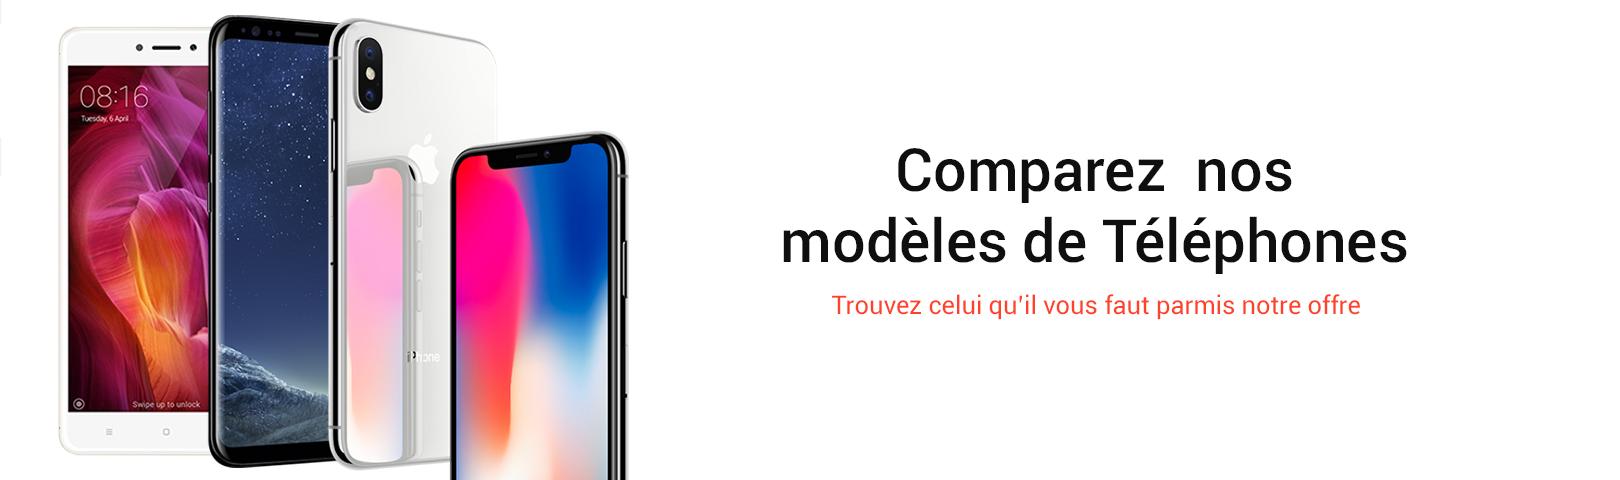 Comparez vos telephones